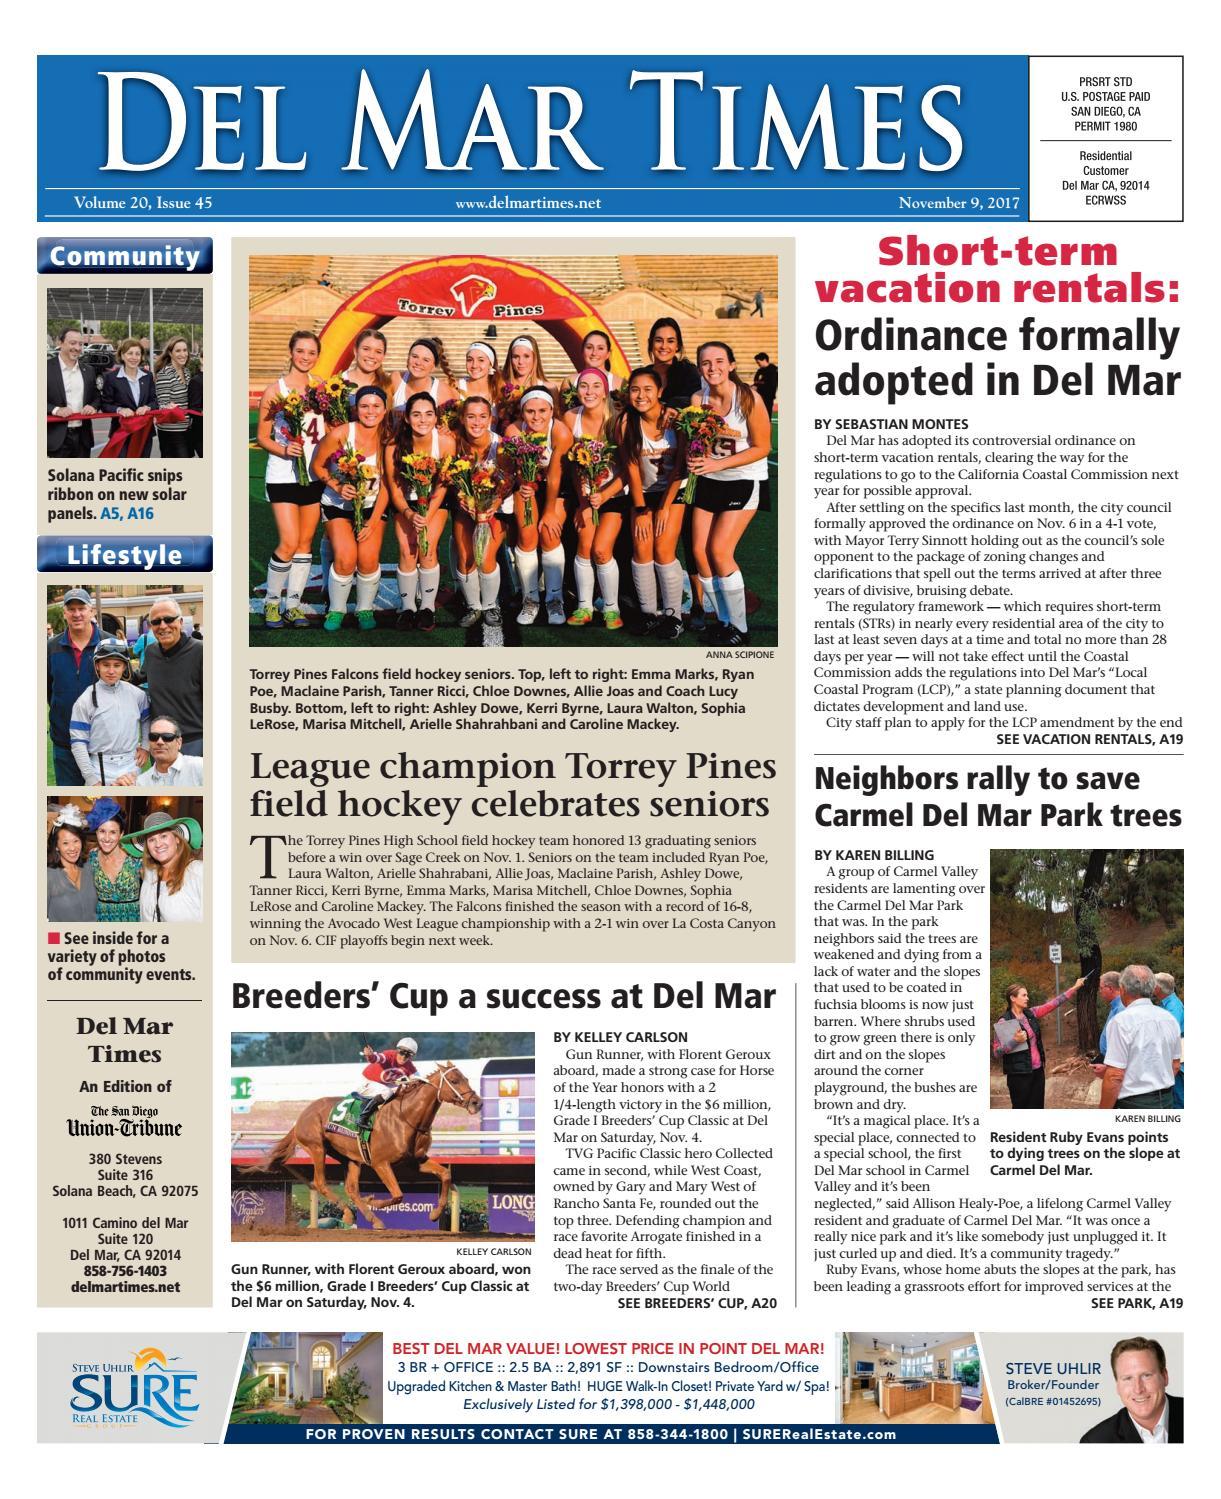 Del Mar Times 11 09 17 By MainStreet Media Issuu